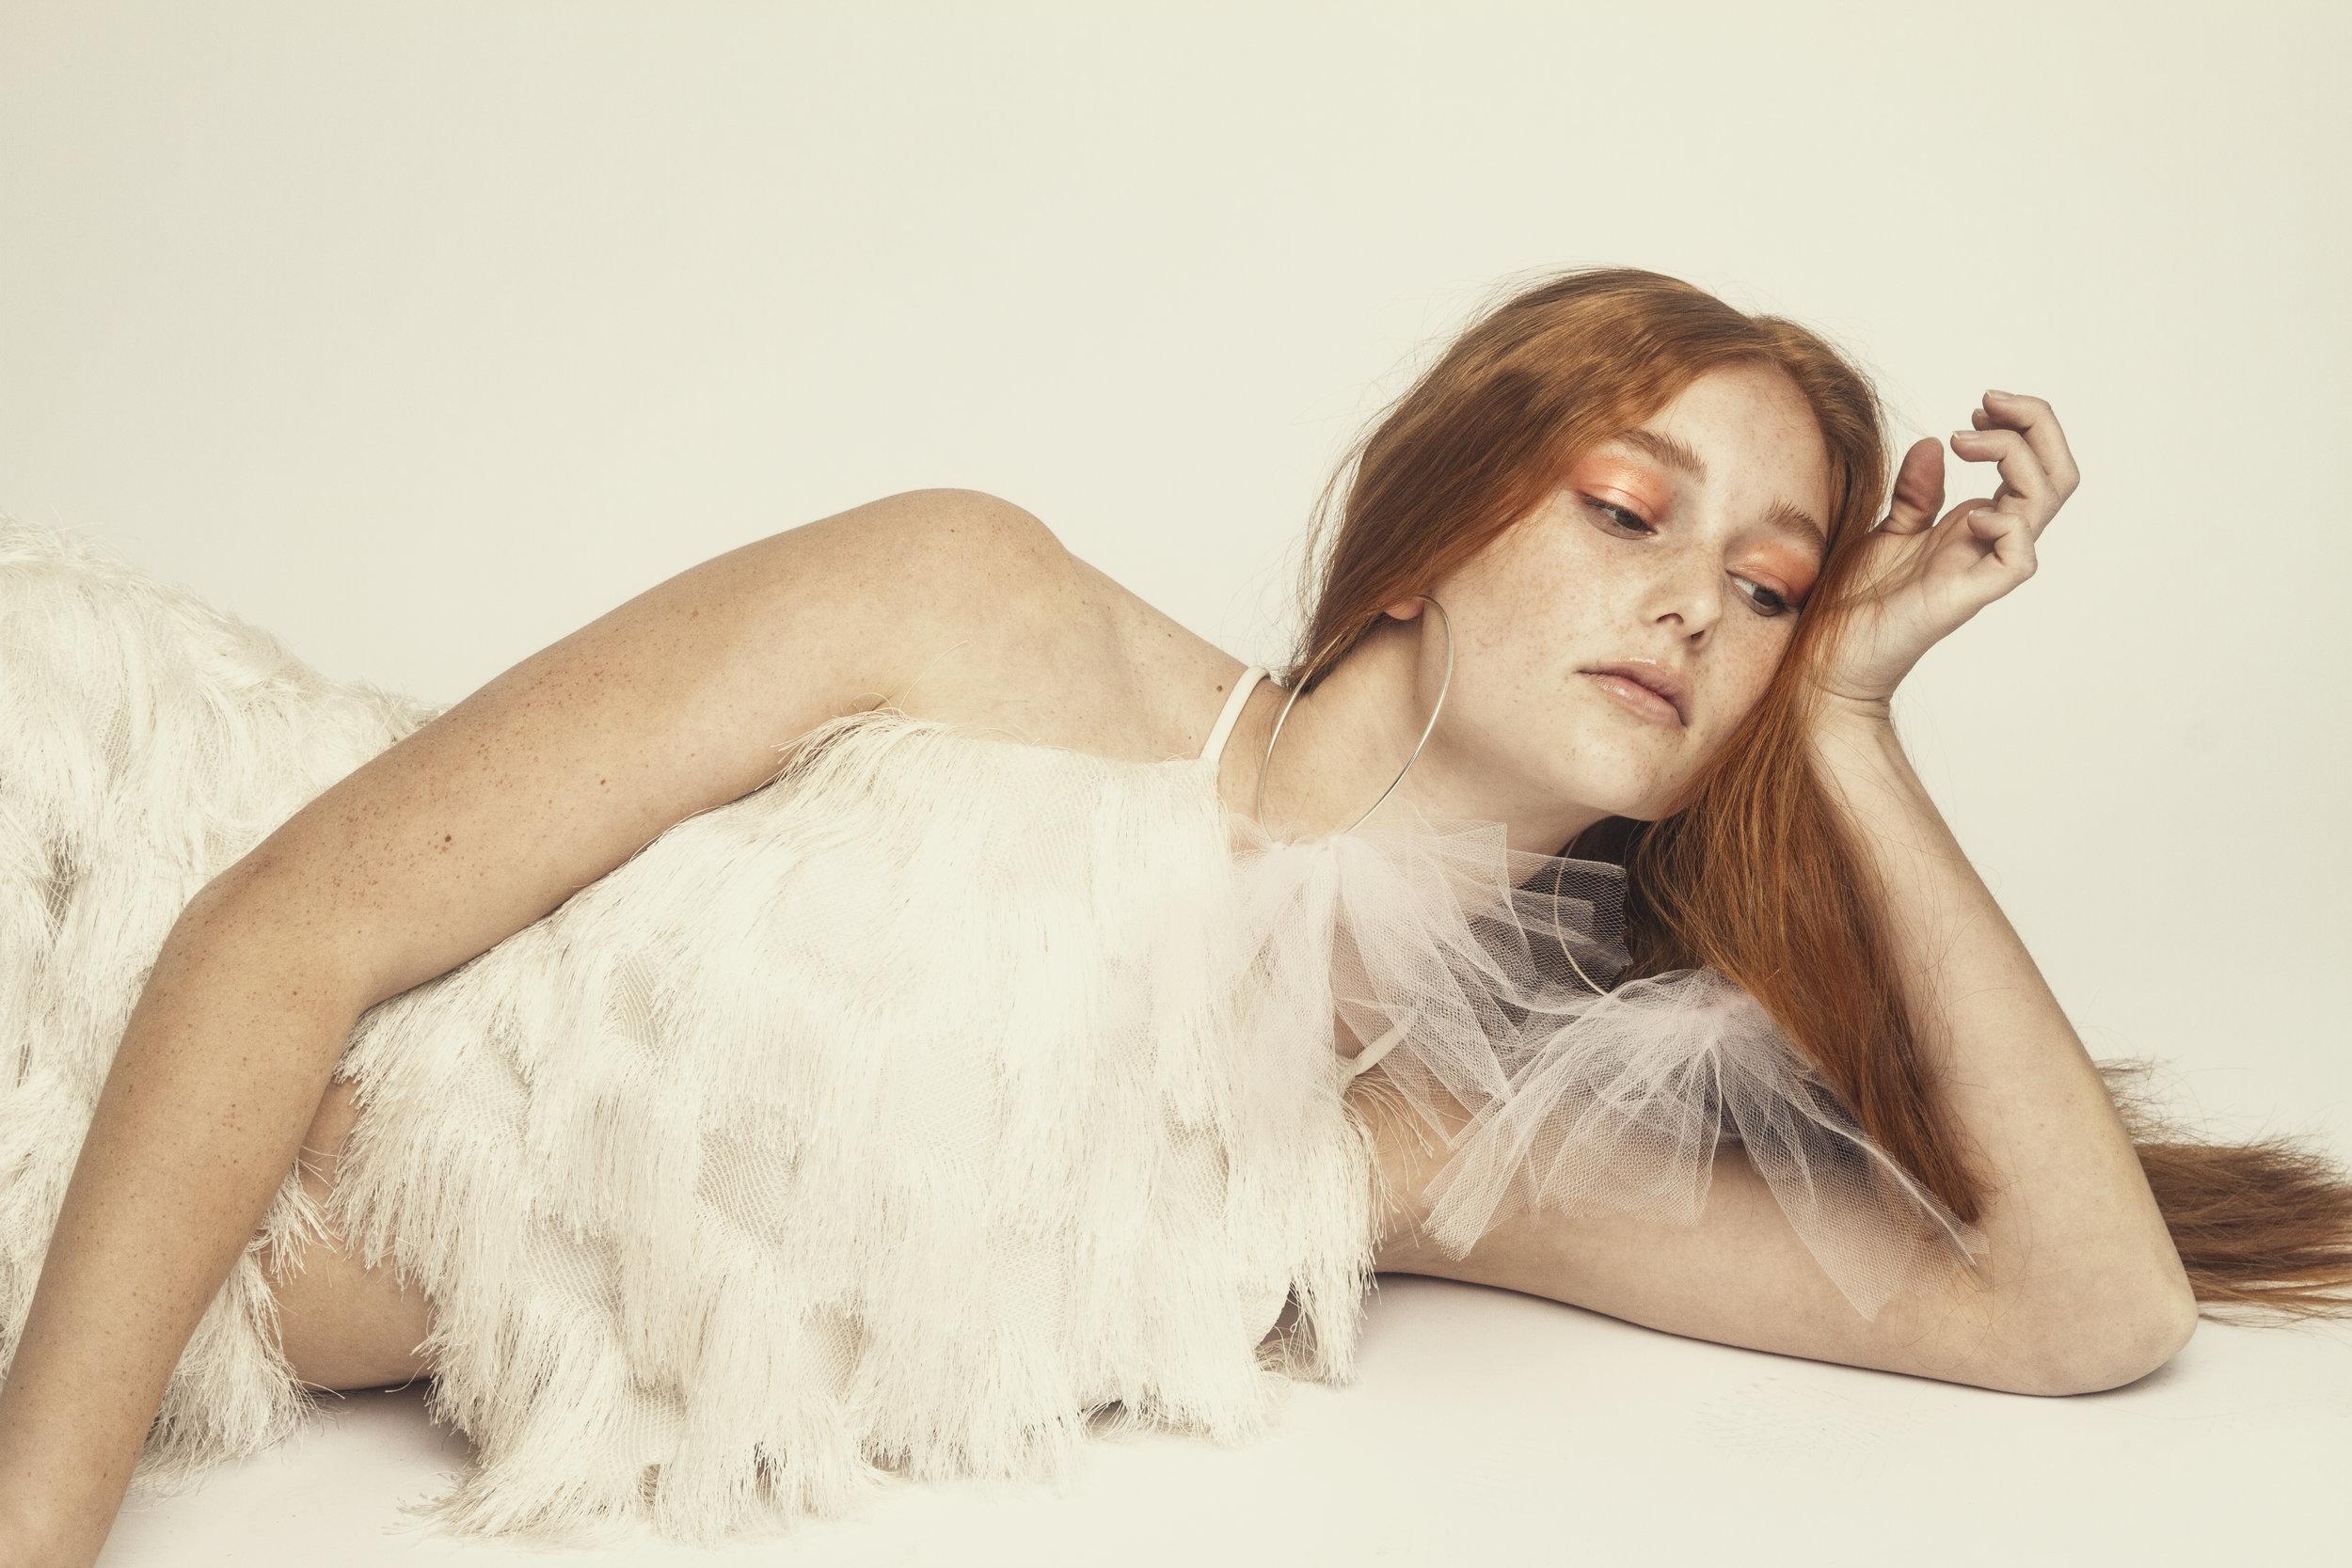 photographer  victoria innocenzi    model  ava    makeup  beckie de angelis    hair  genevieve gian    styled by me